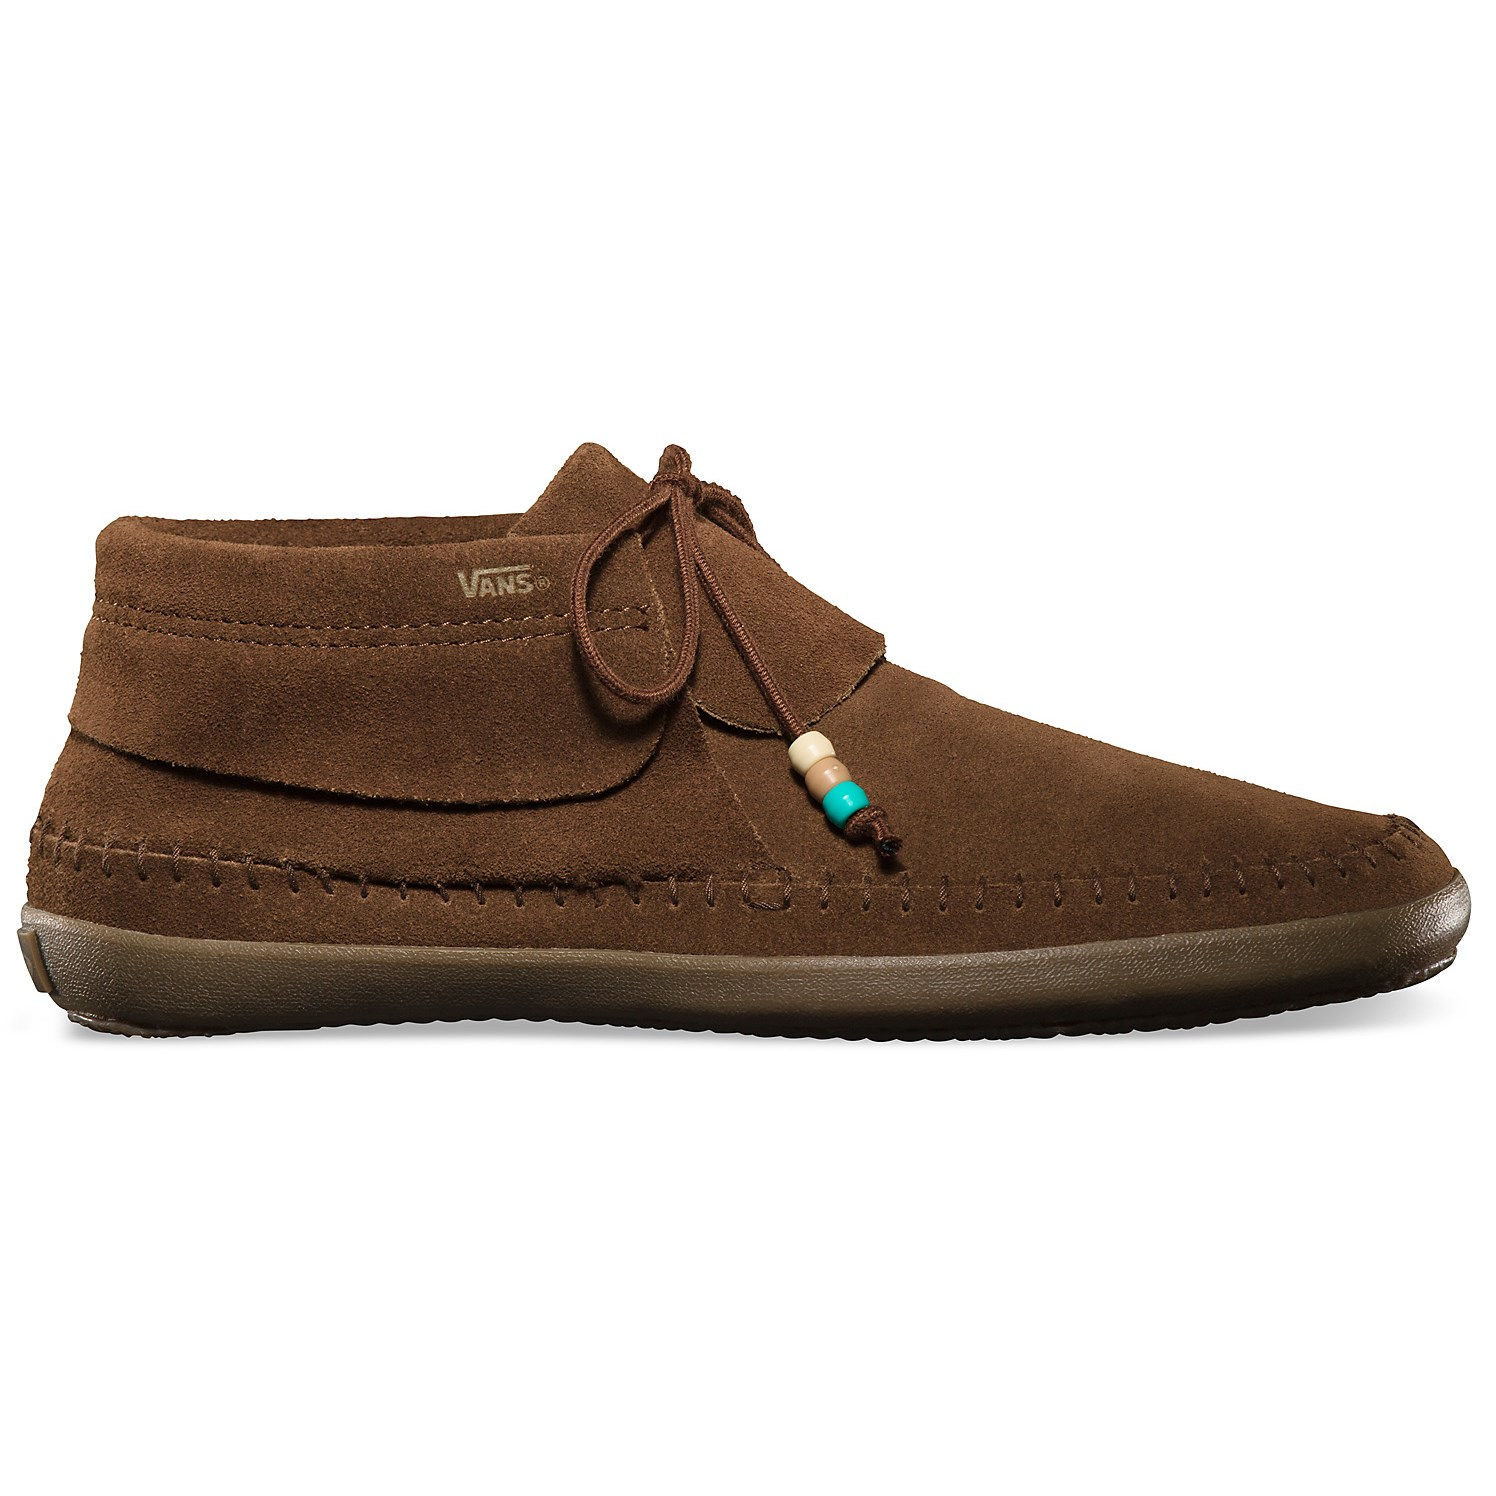 e09e1e88f7 Vans Mohikan Shoes - Women s